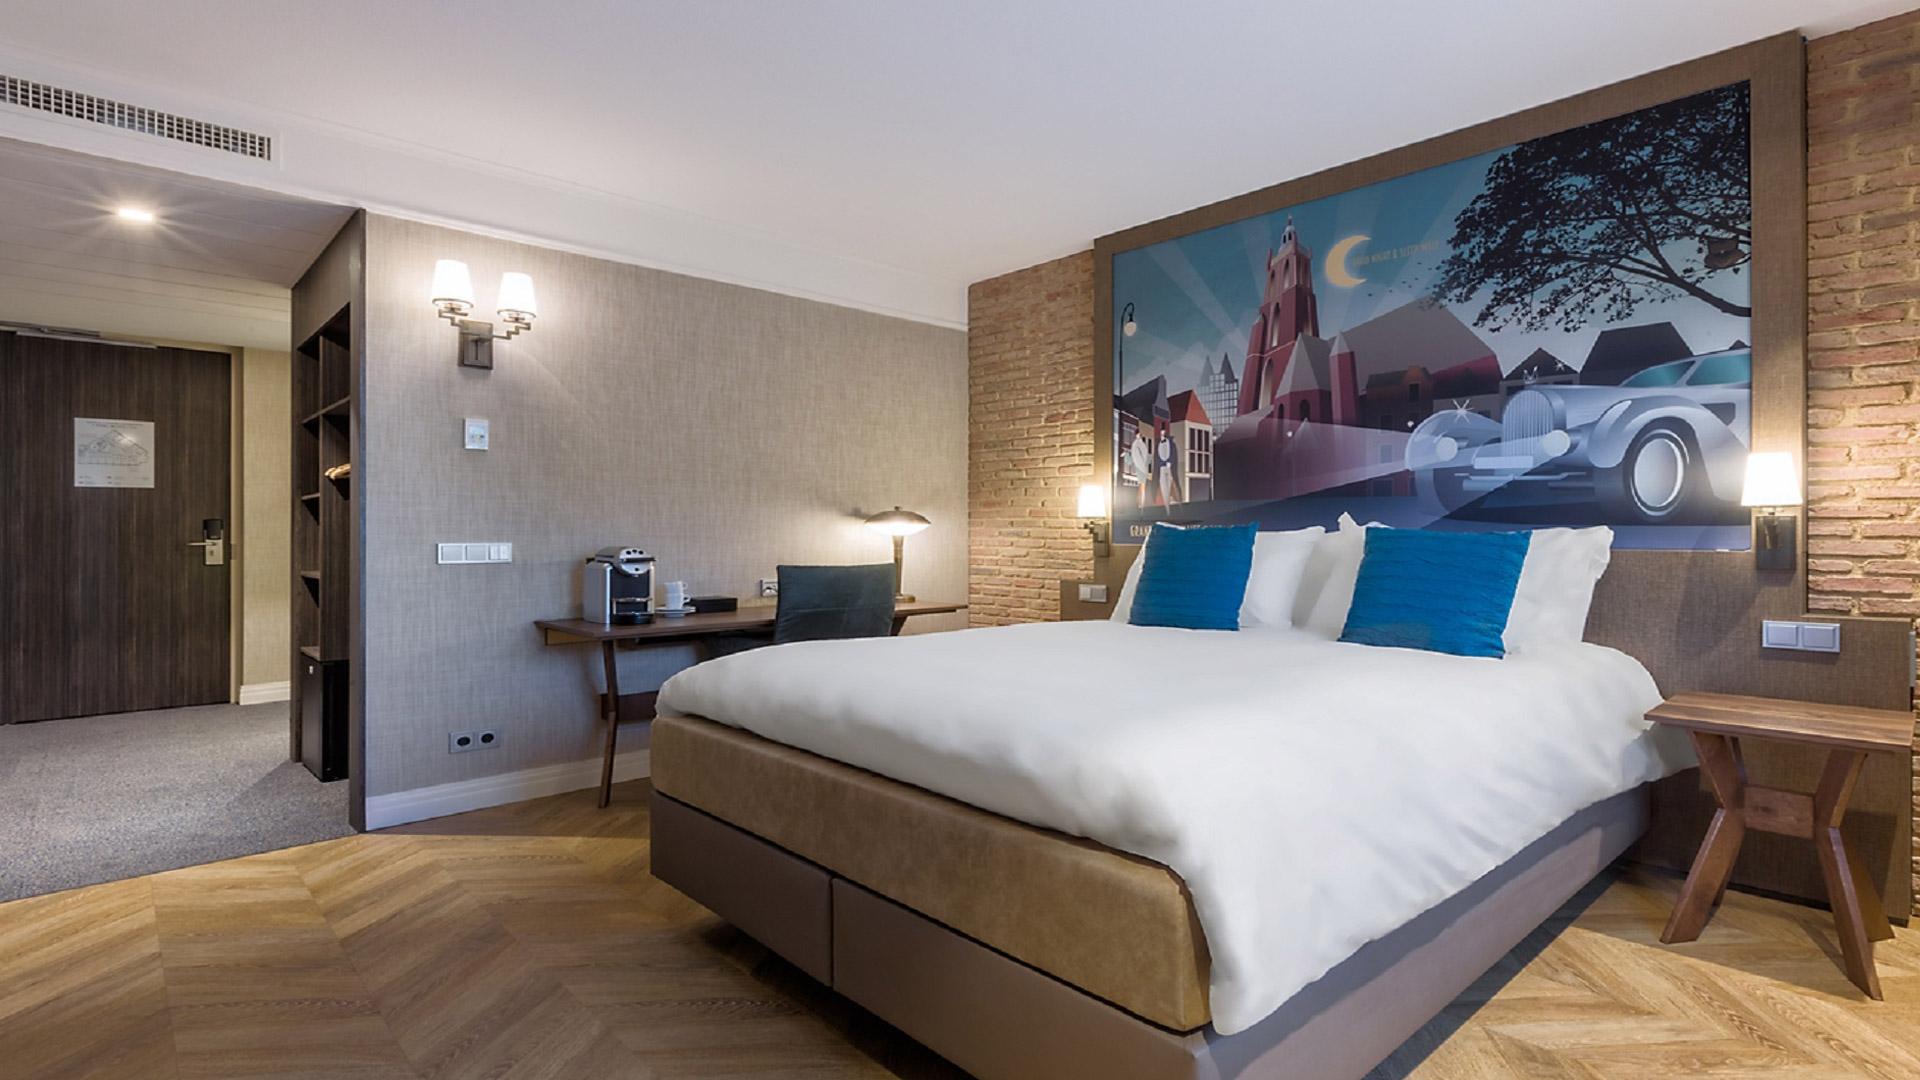 Hotel Valies Roermond